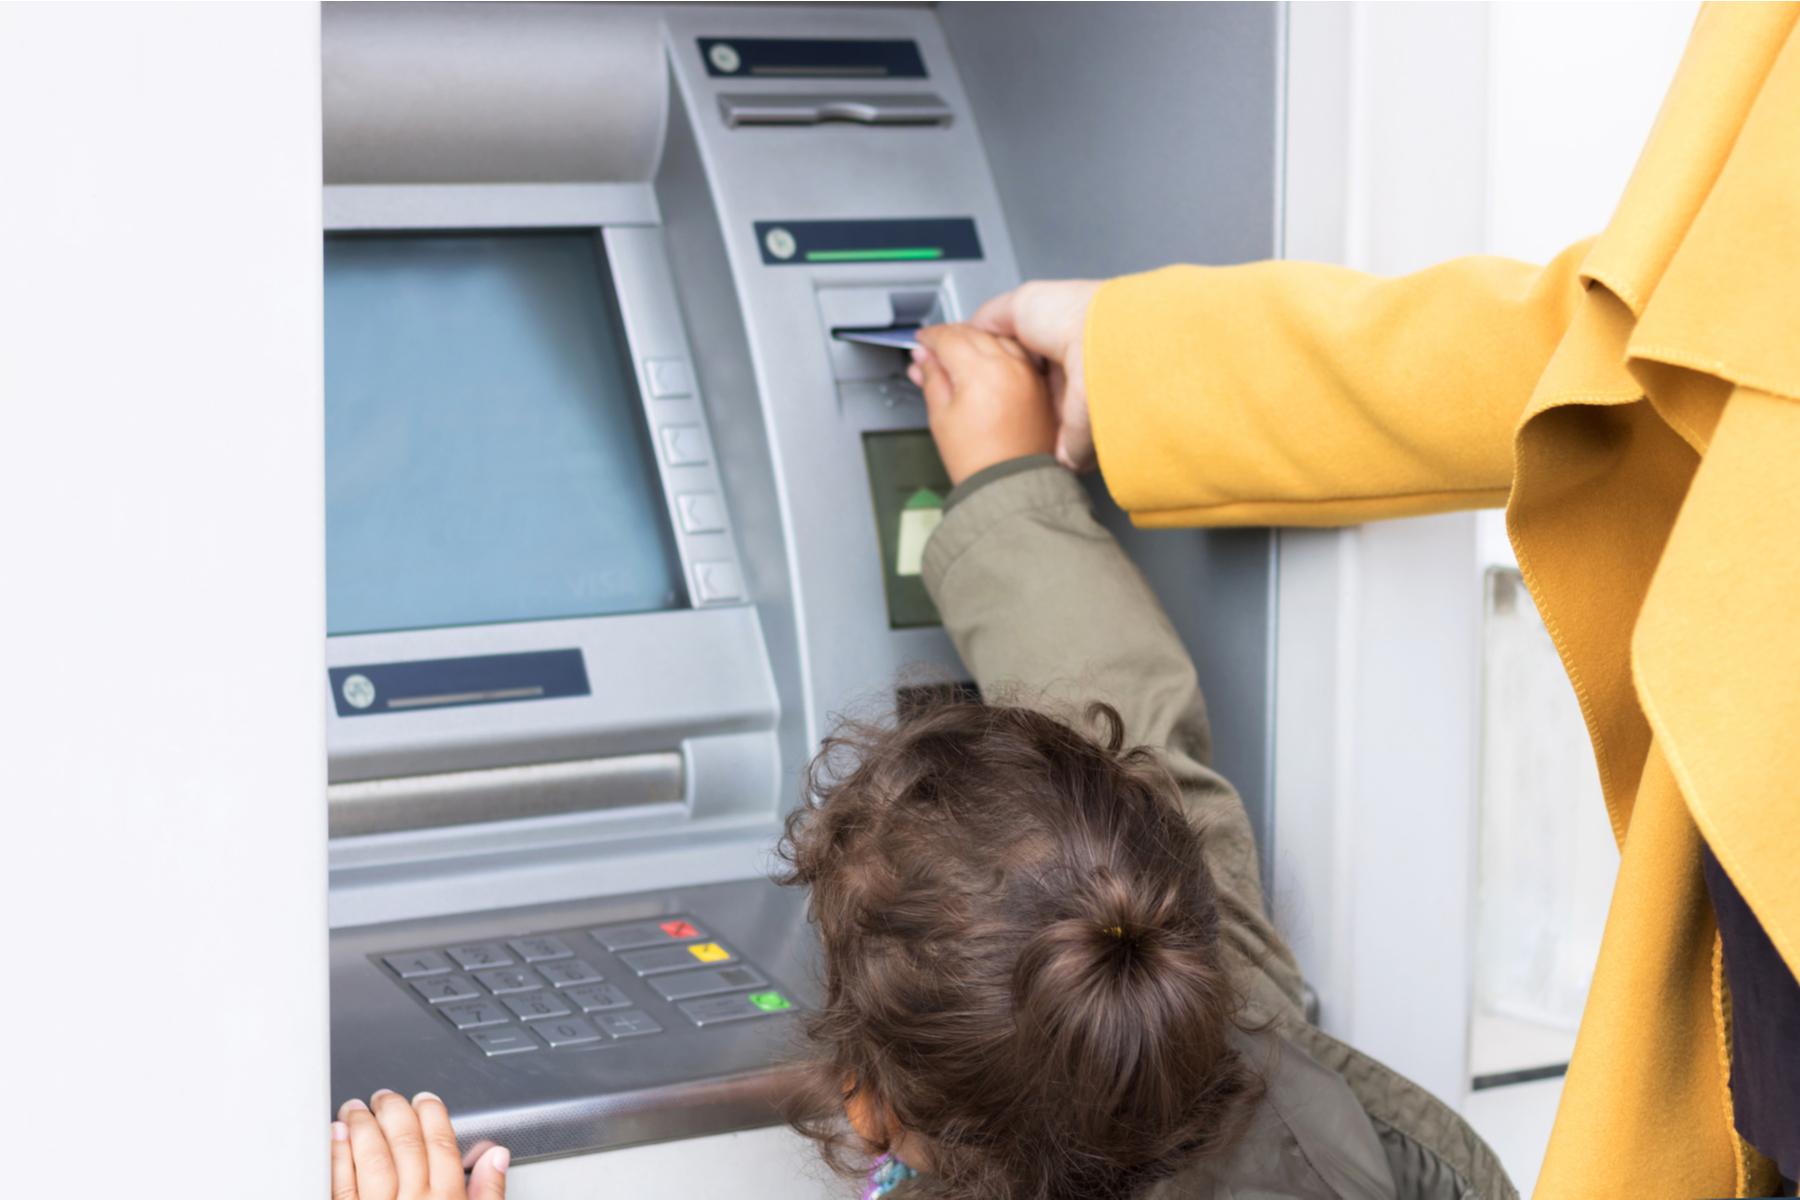 Kid using ATM